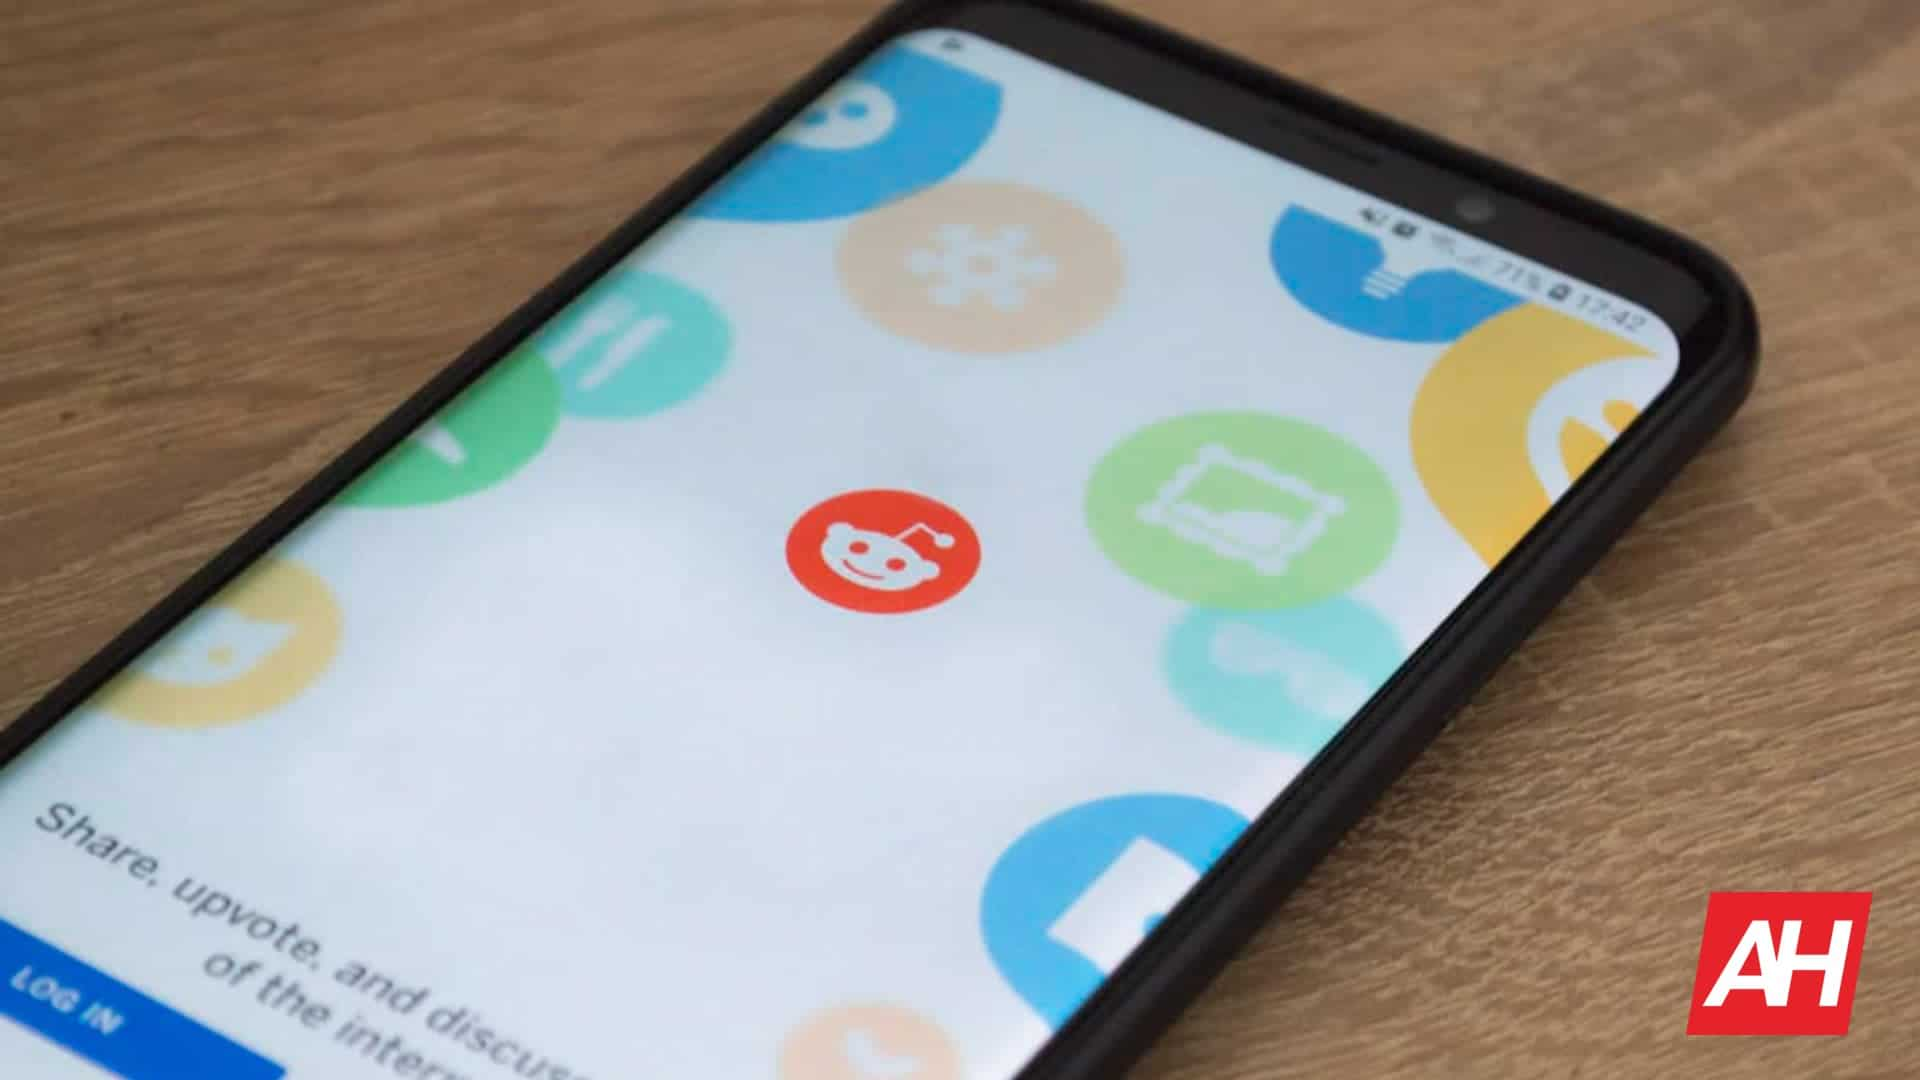 Reddit App Login Screen Logo July 2018 AH 2020